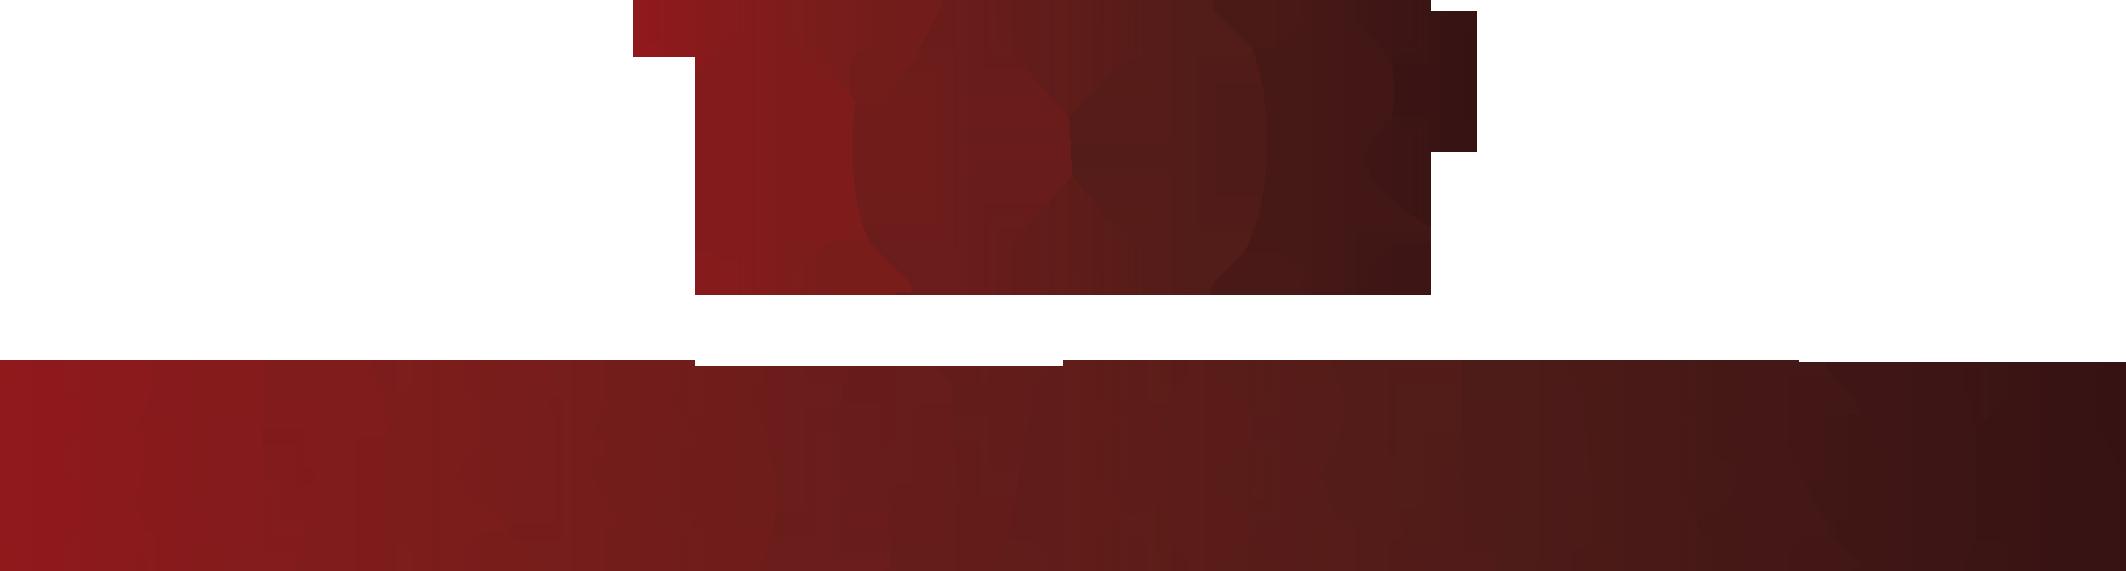 Top Empowerment